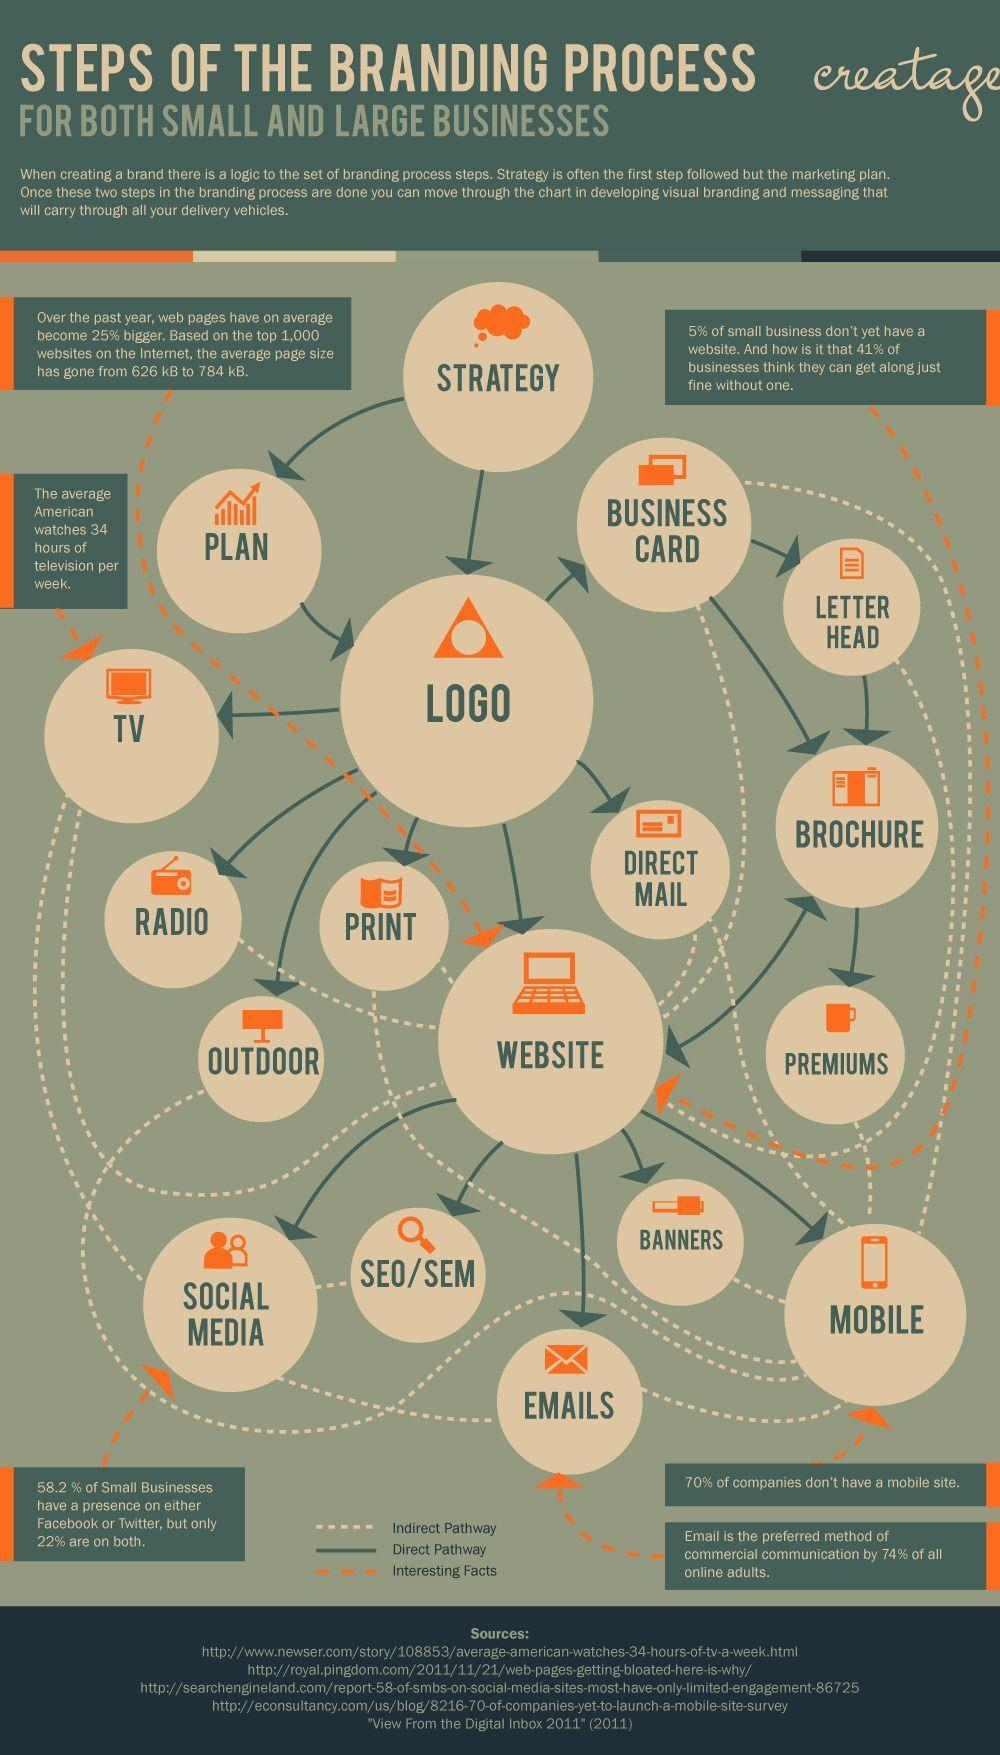 Design Steps Of The Branding Process Starting From Step 1 Strategy Manajemen Bisnis Infografis Dan Pemasaran Media Sosial